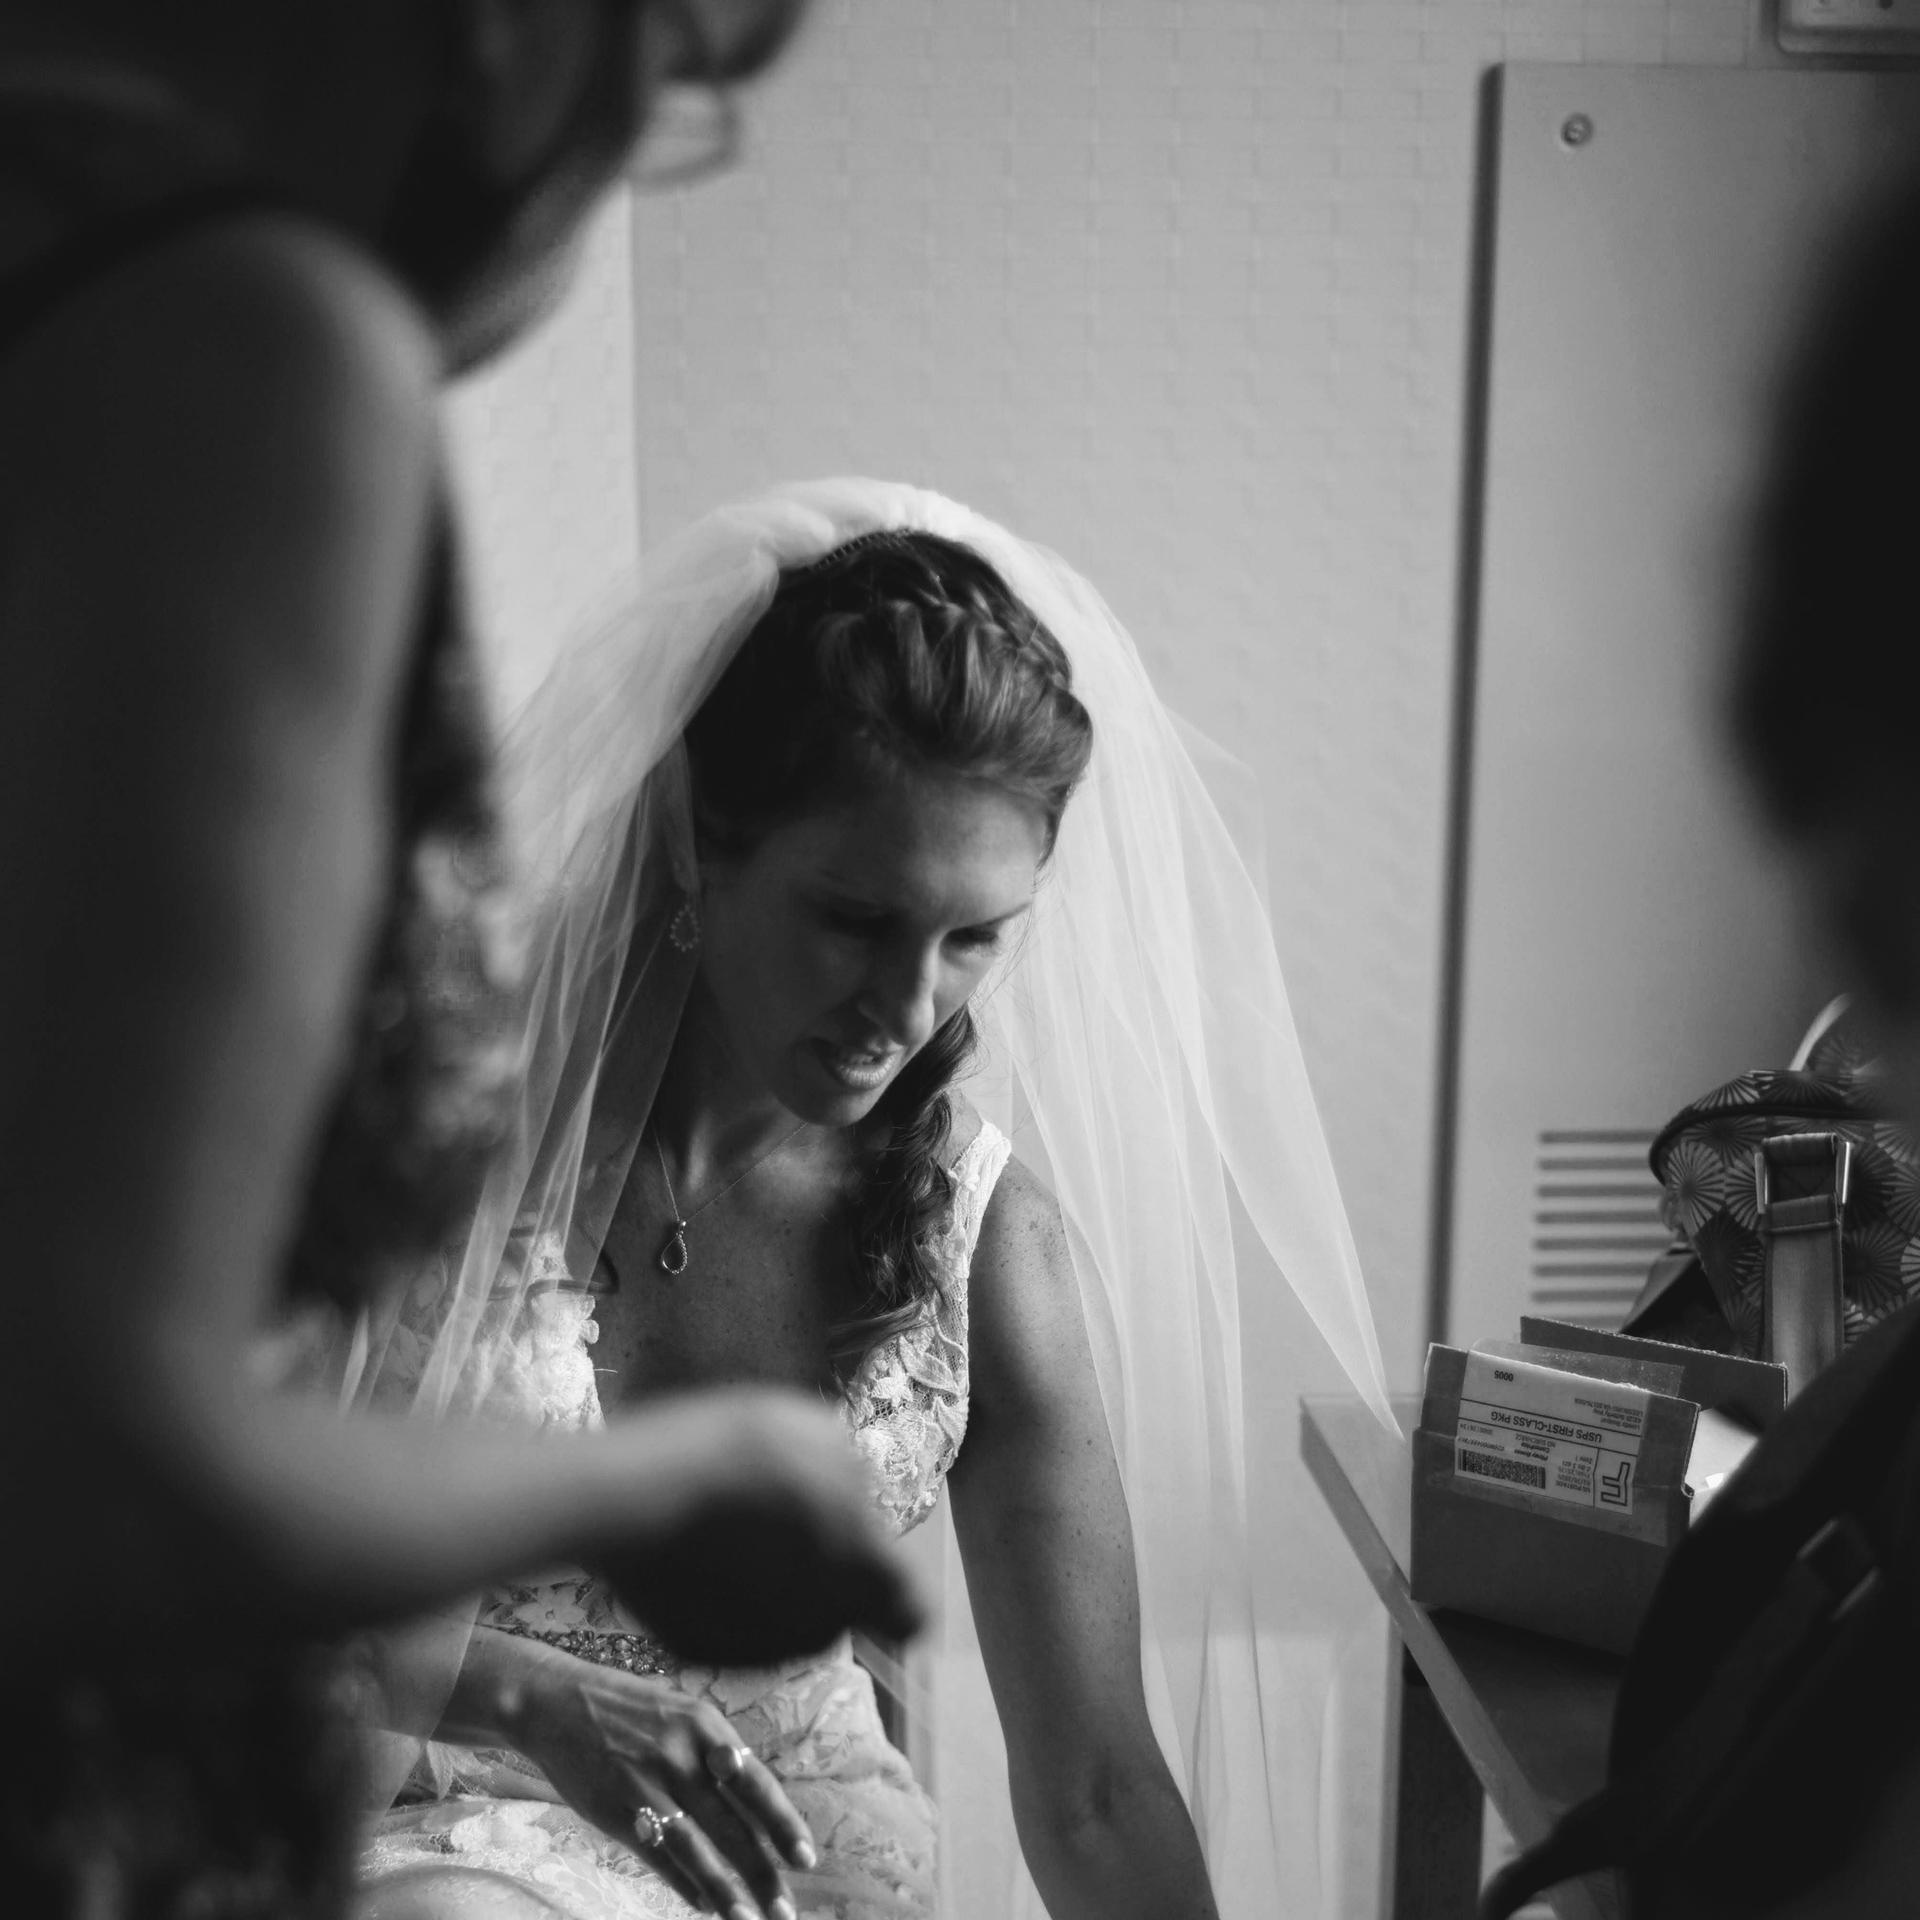 documentary style wedding photography baltimore maryland